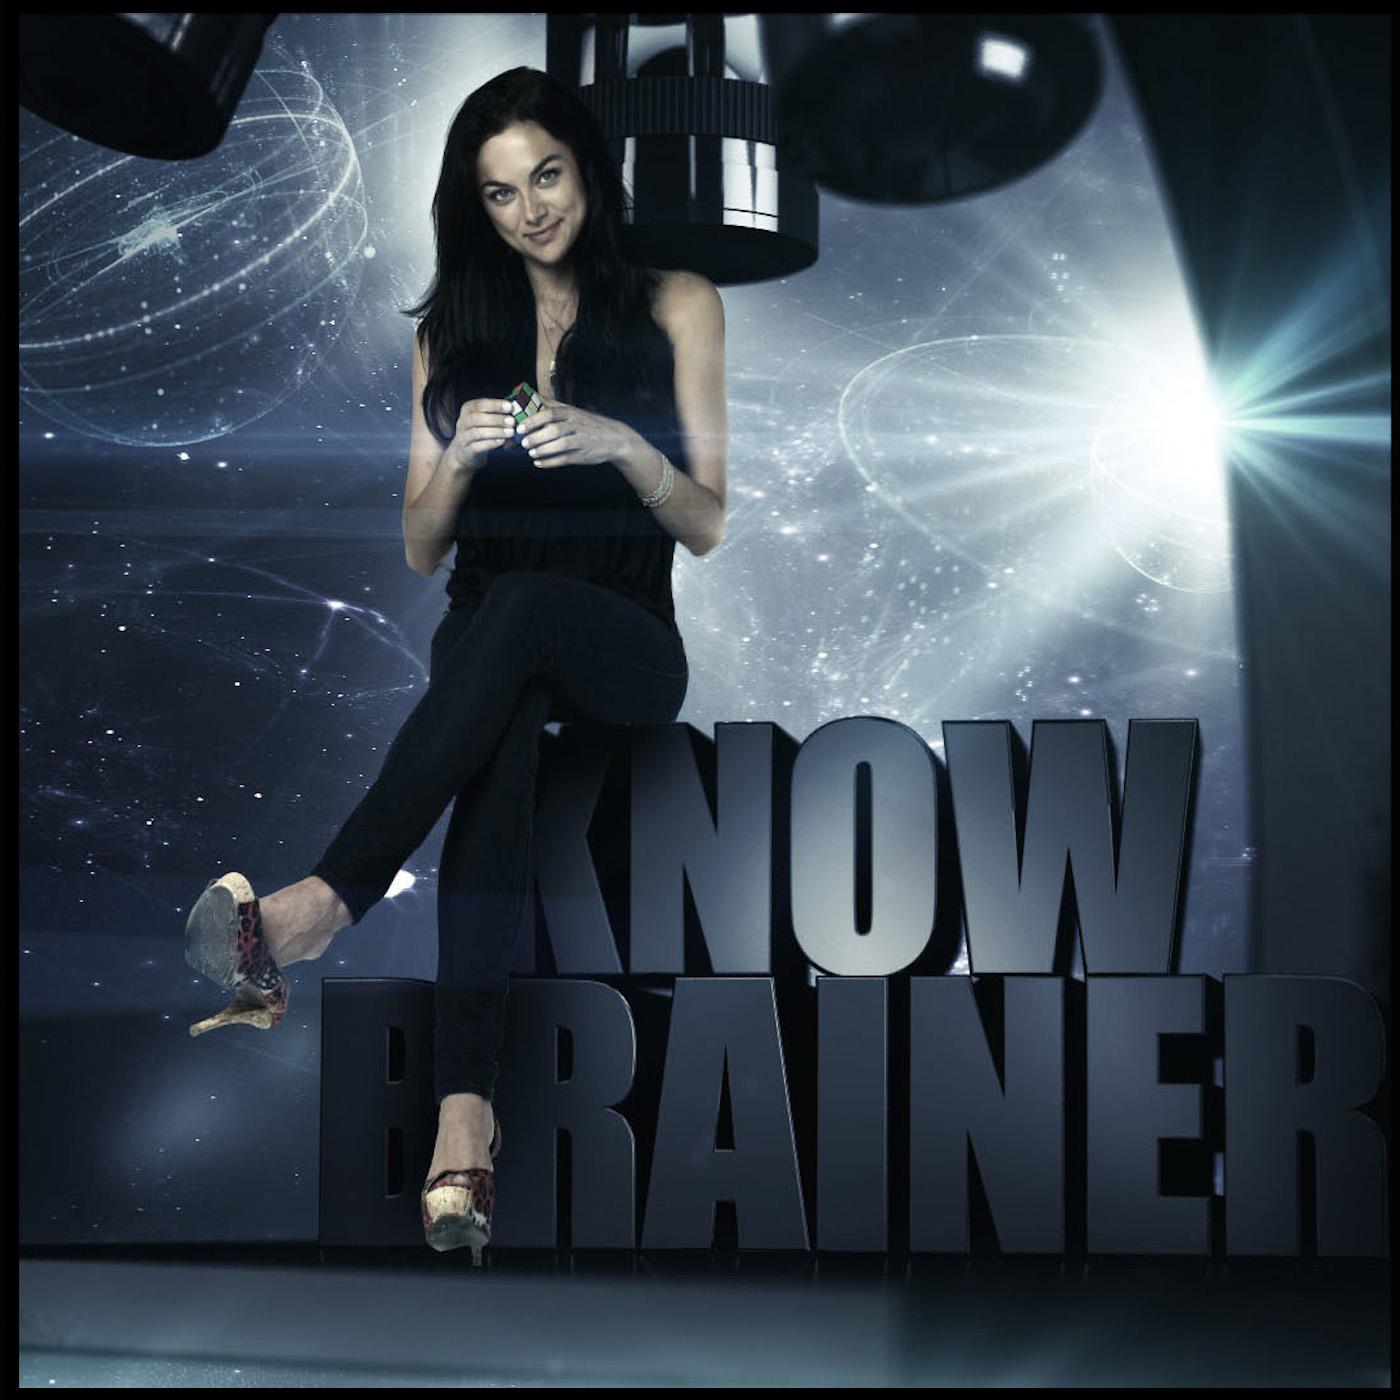 KNOW BRAINER PODCAST - Catalyze Curiosity! Hosted by Christina Ochoa